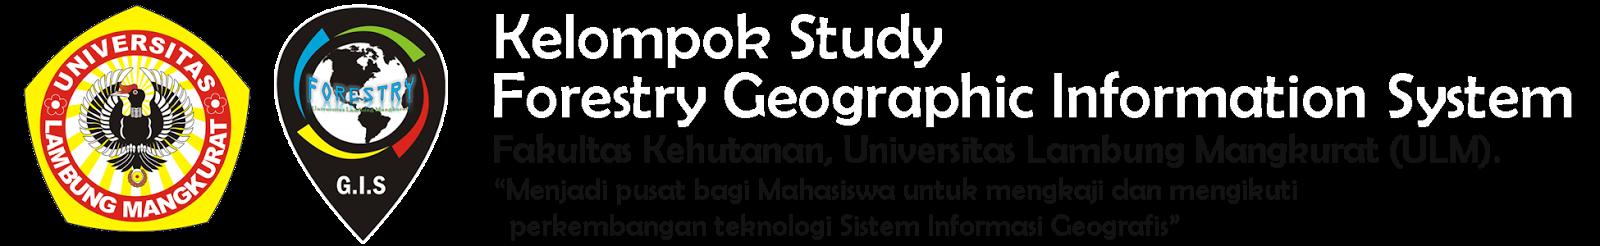 Kelompok Study Forestry GIS